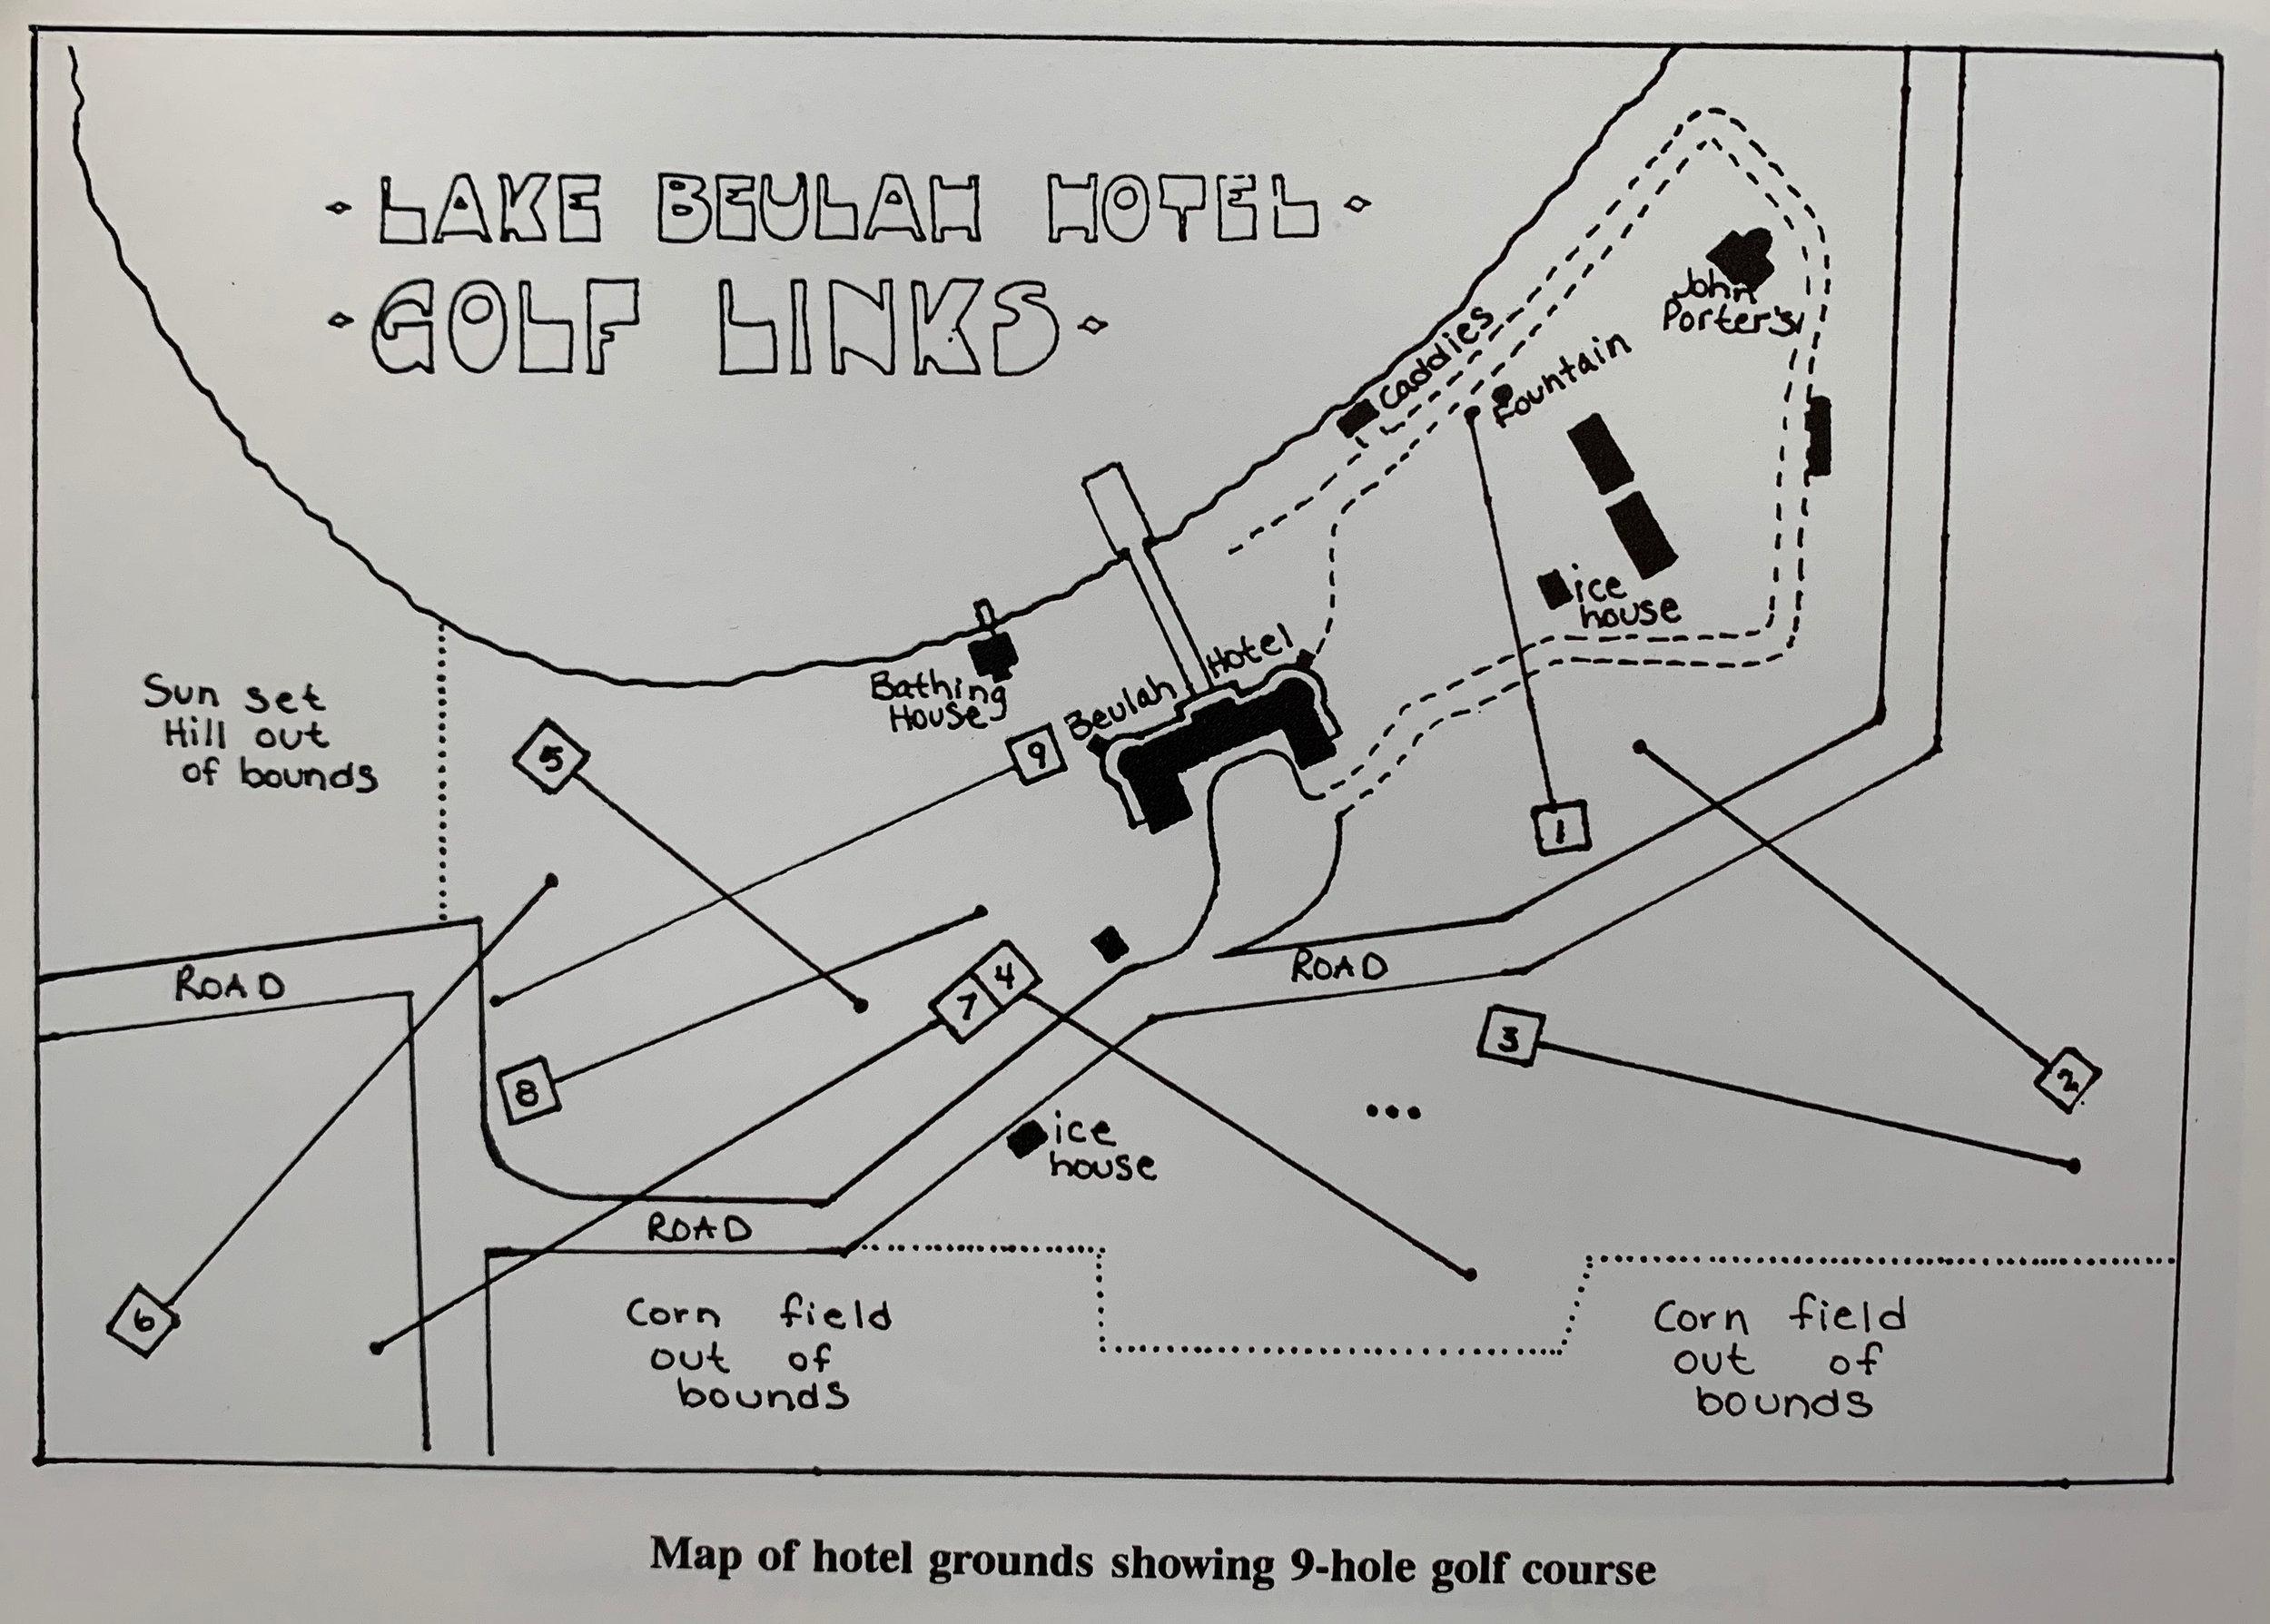 Lake_Beulah_History_LBYC-004.jpg